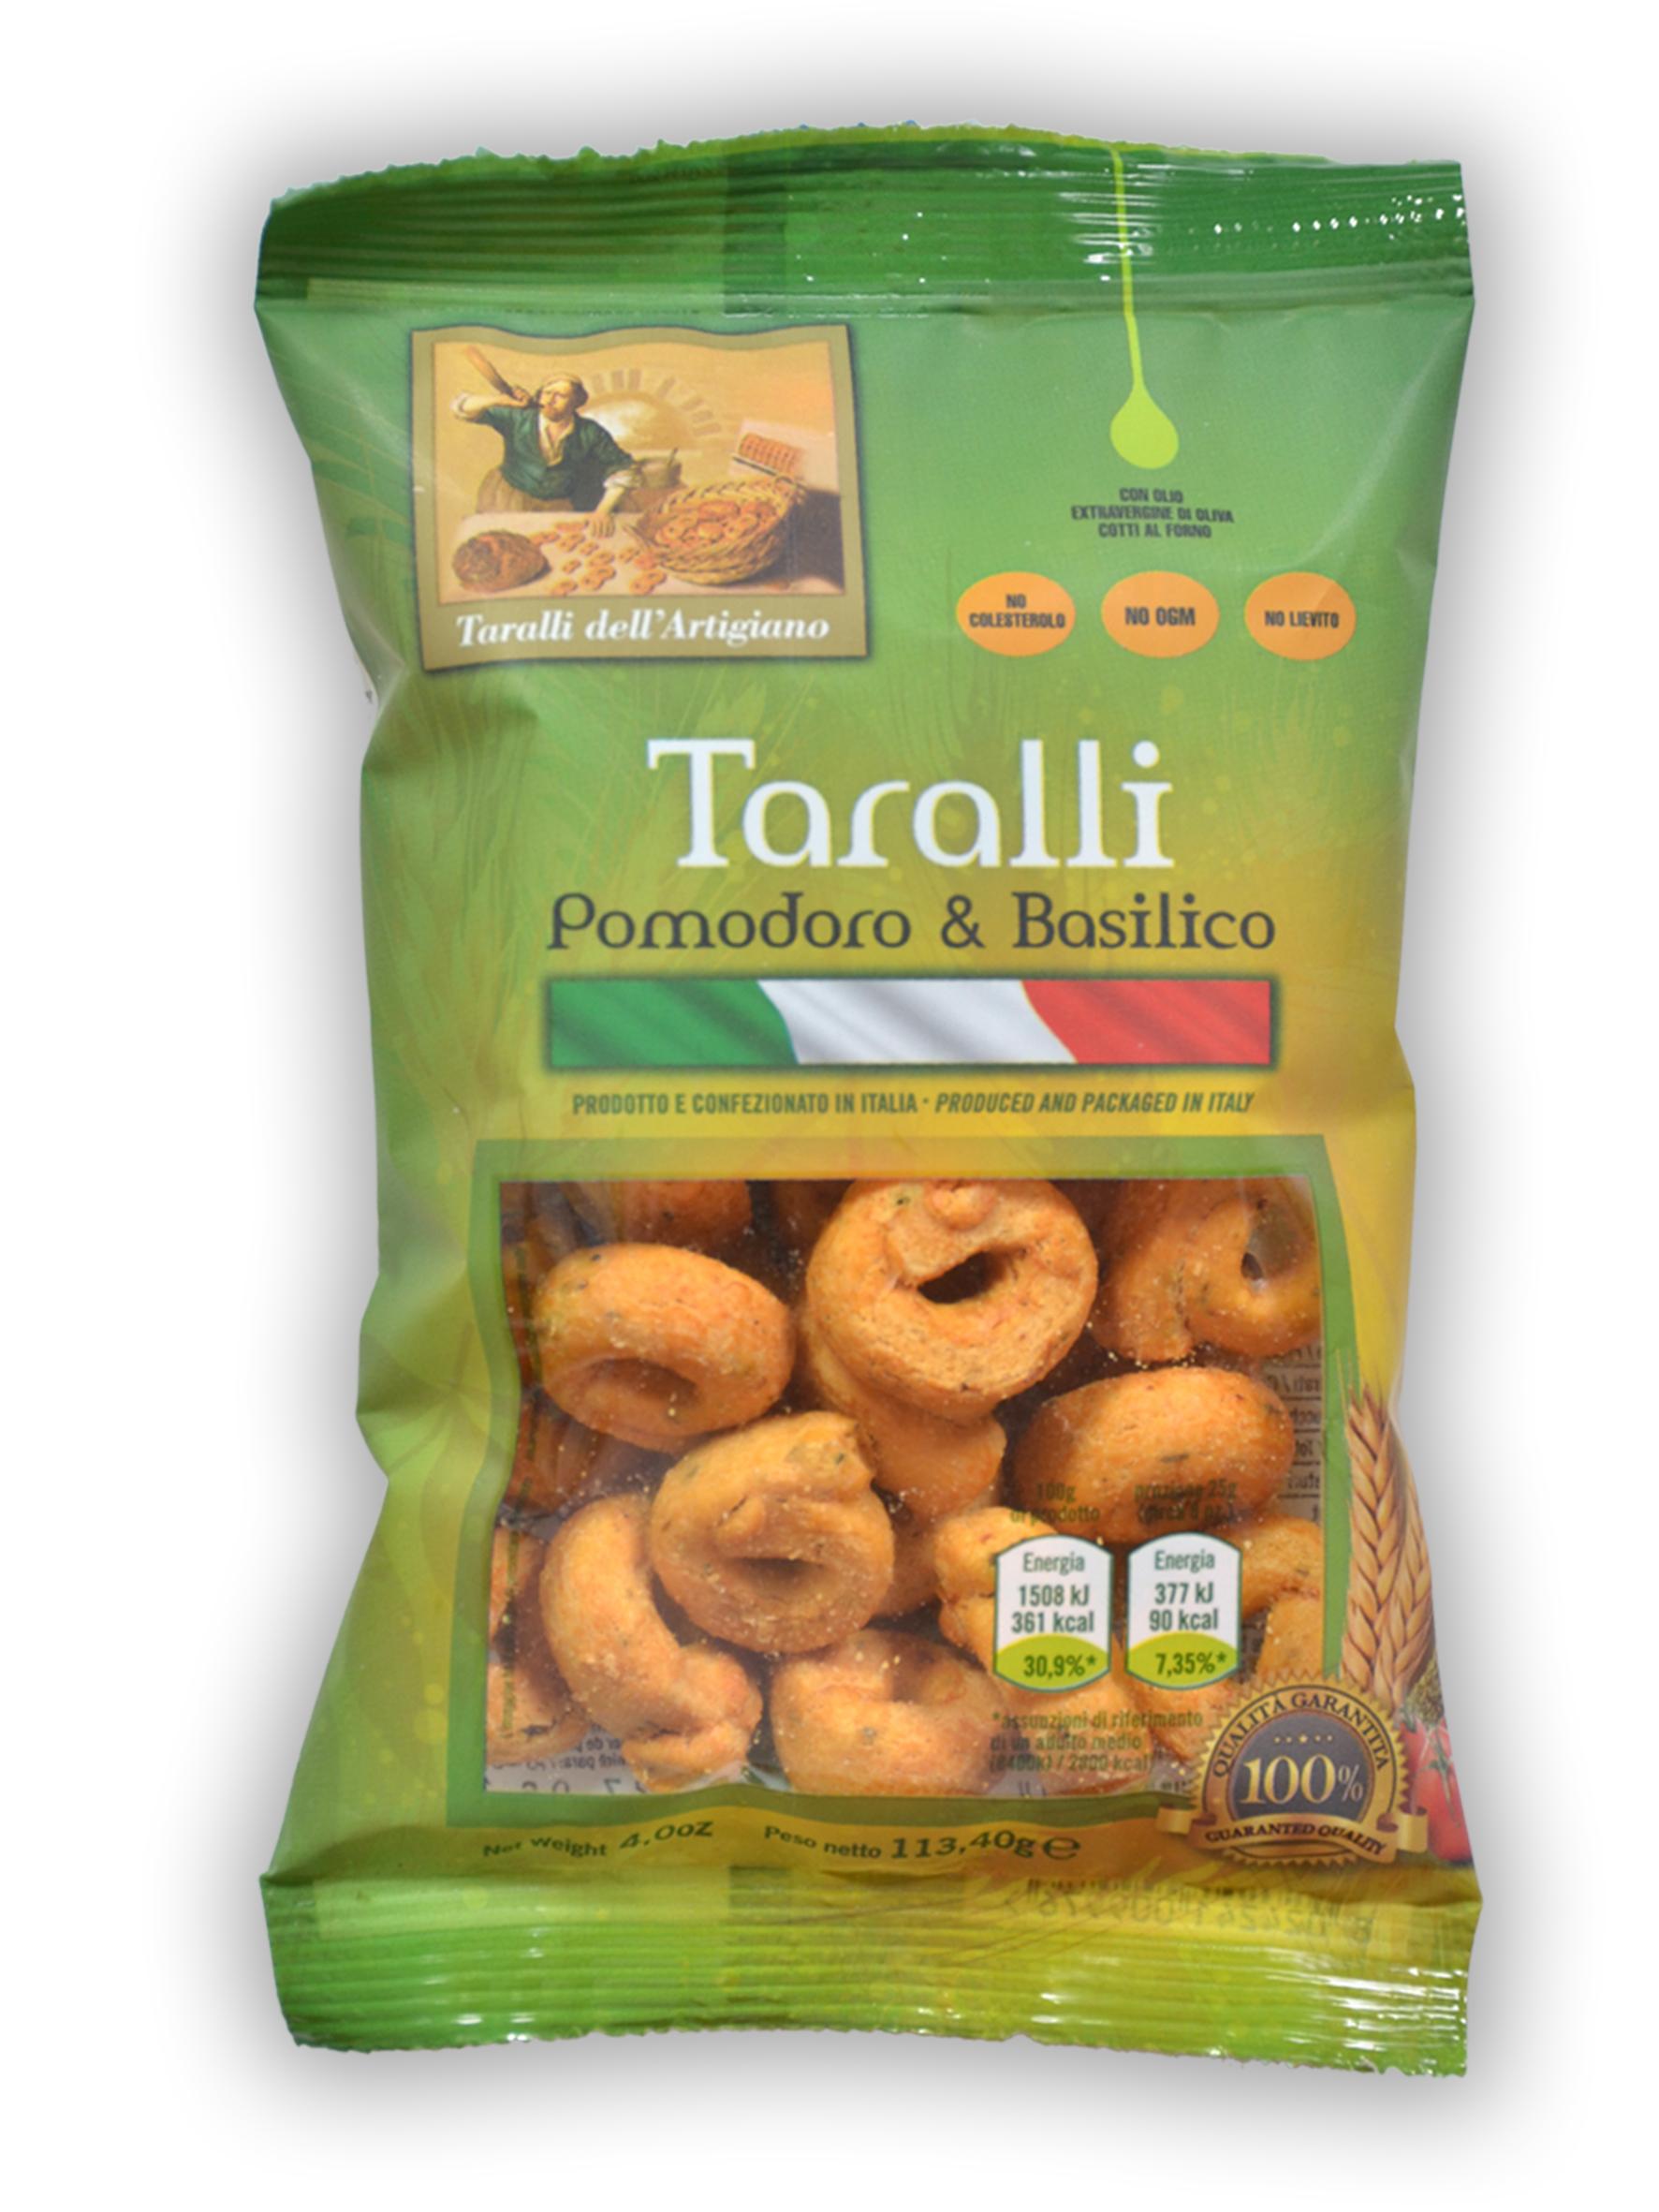 Taralli Friabili (pomodoro&basilico)